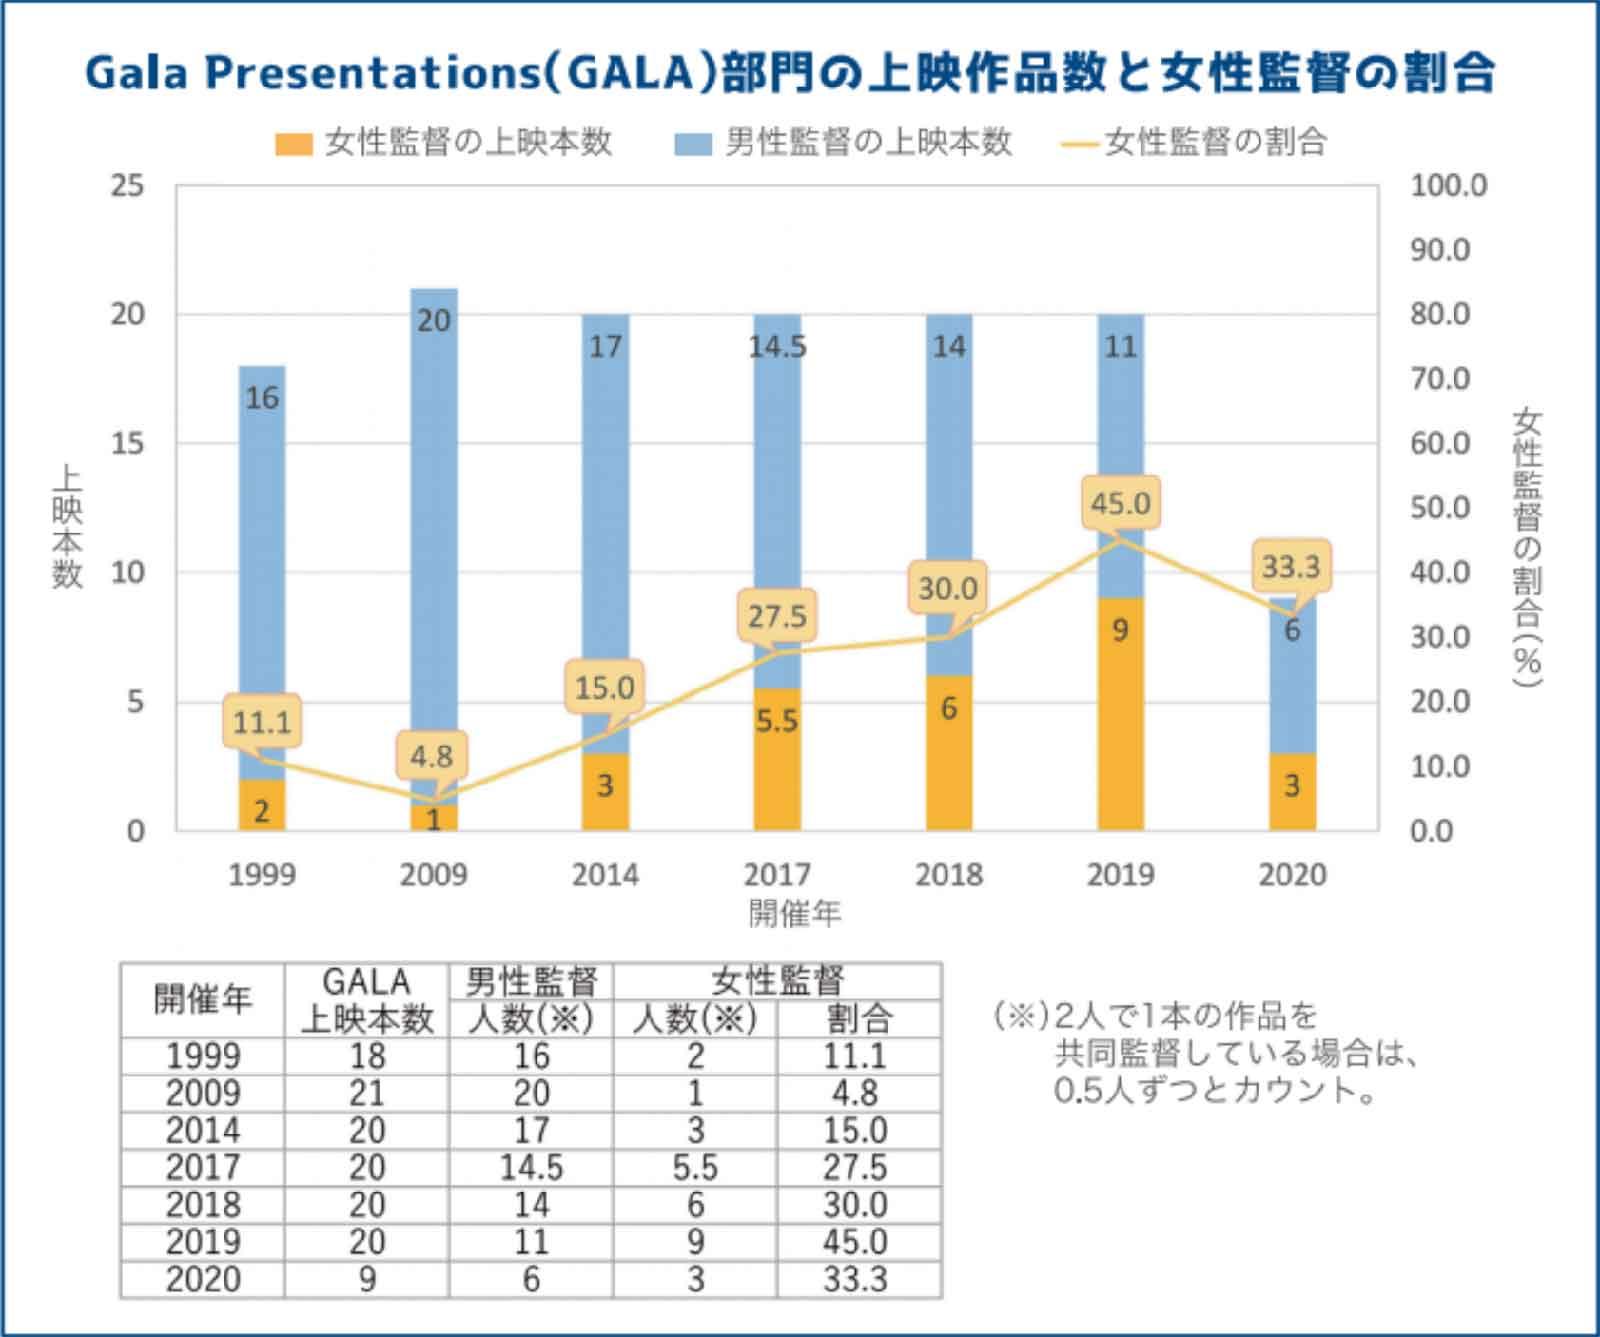 Gala Presentations(GALA)部門の上映作品数と女性監督の割合